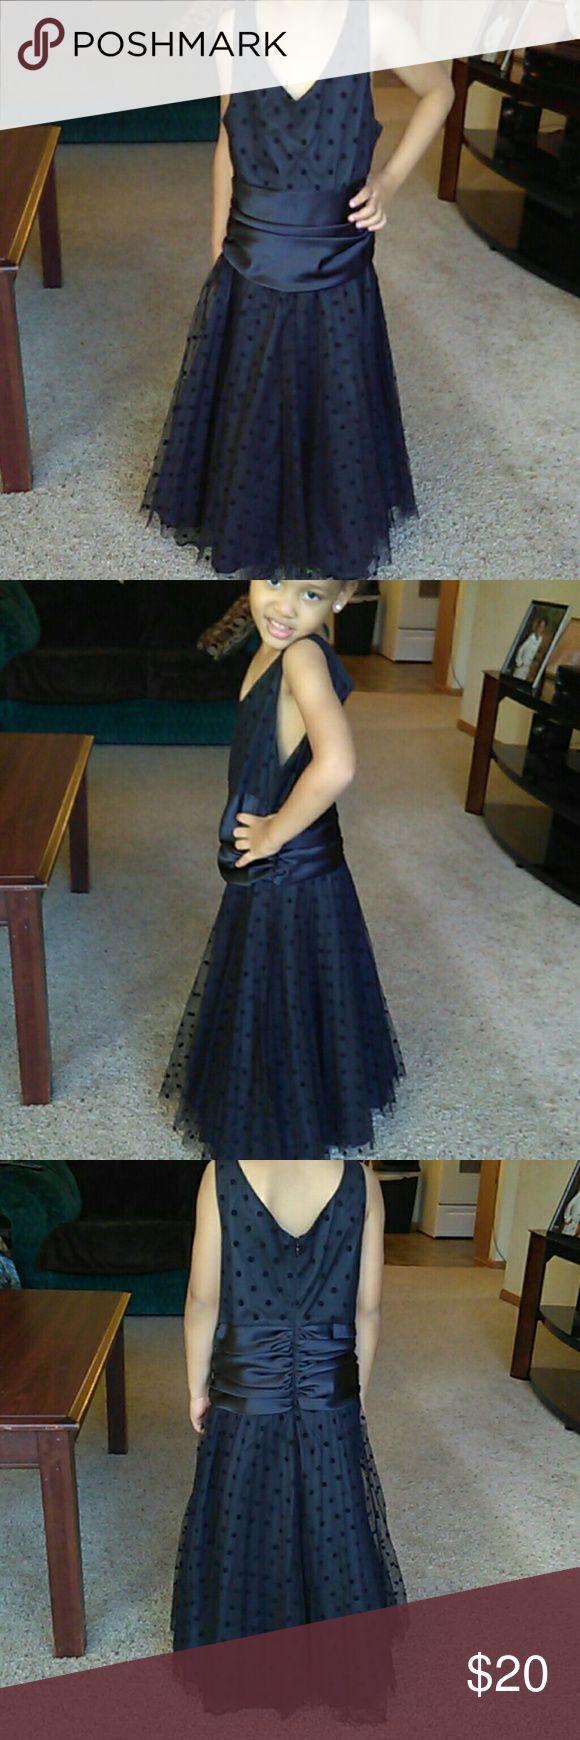 Bonnie Jean Dress Girls size 10 beautiful like new... Modeled on a 4y old Bonnie Jean Dresses